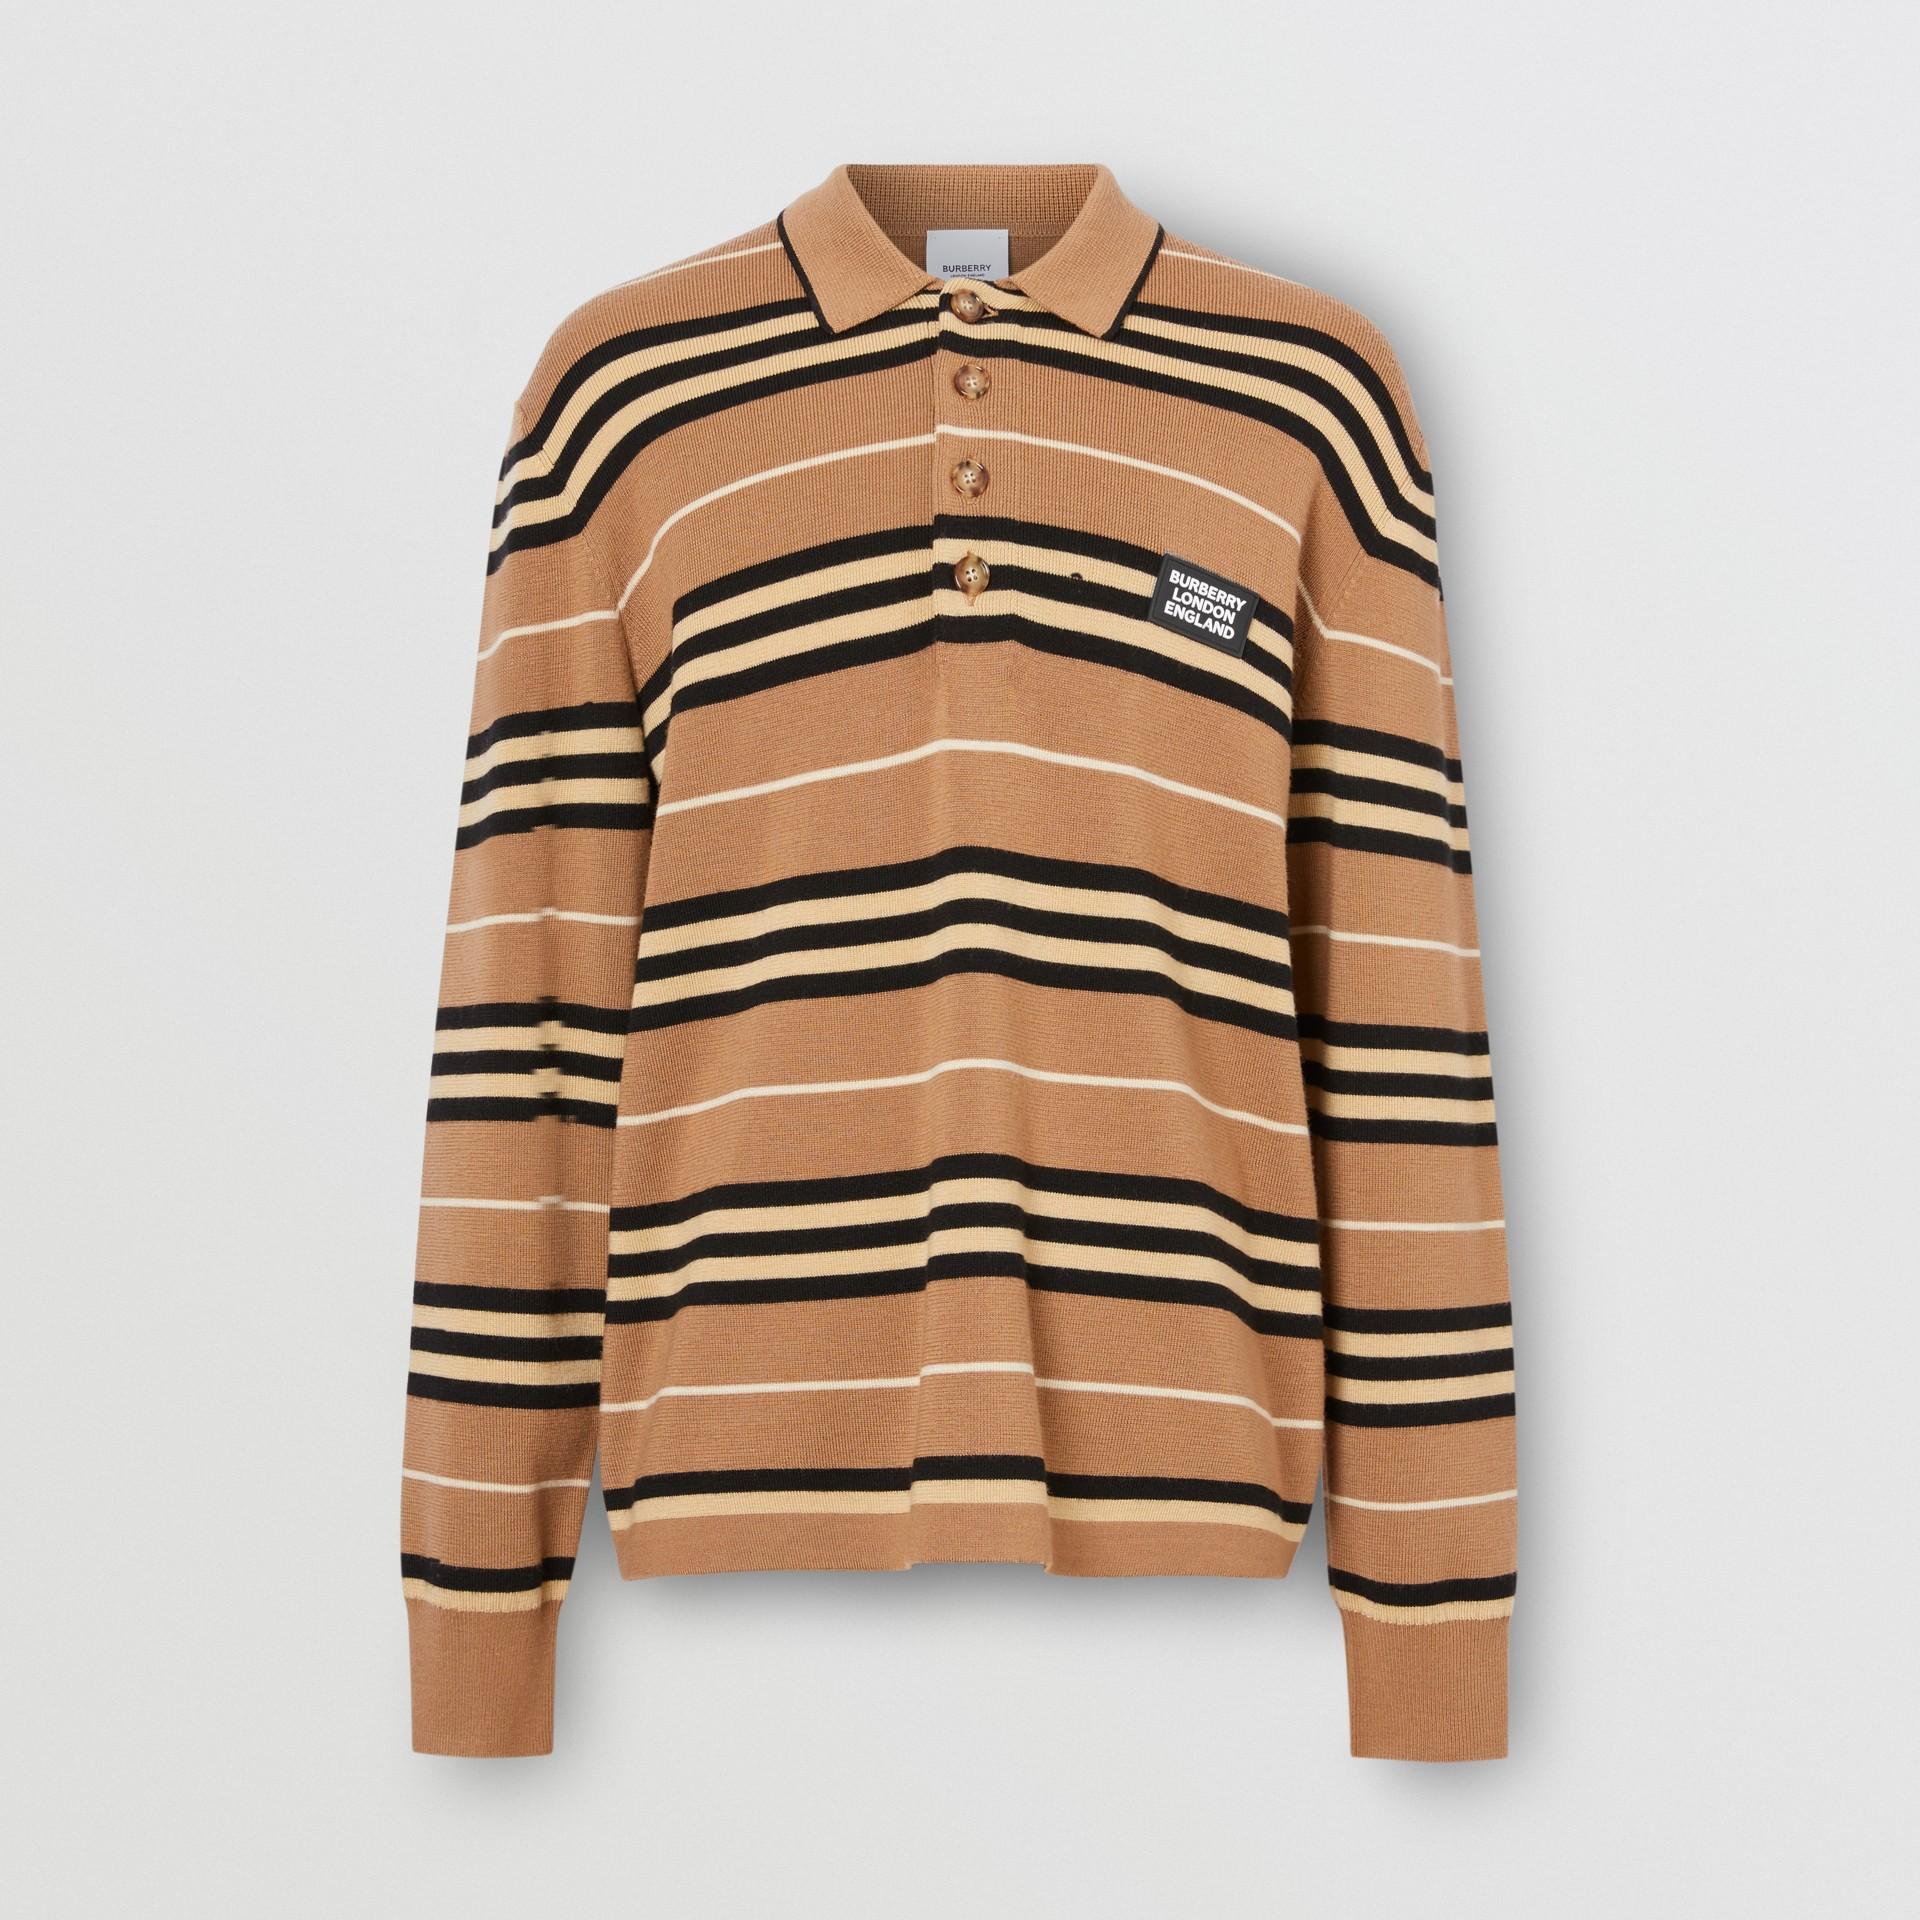 Long-sleeve Icon Stripe Merino Wool Polo Shirt in Warm Walnut - Men | Burberry United Kingdom - gallery image 3